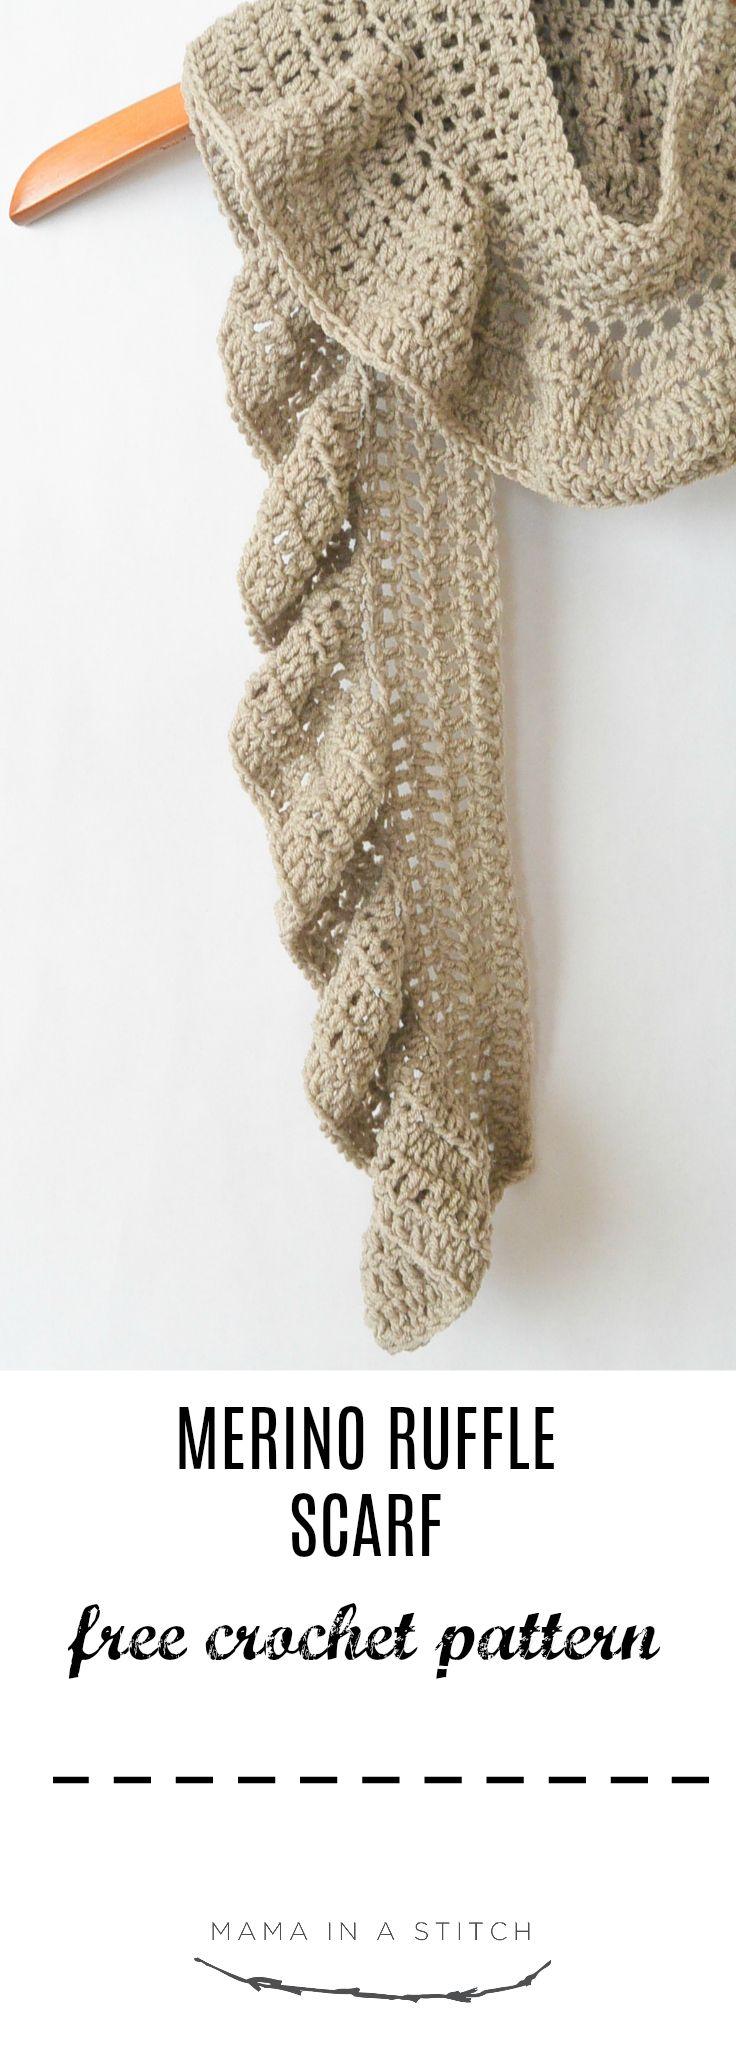 Merino Crocheted Ruffle Scarf Pattern Crochet Para El Alma